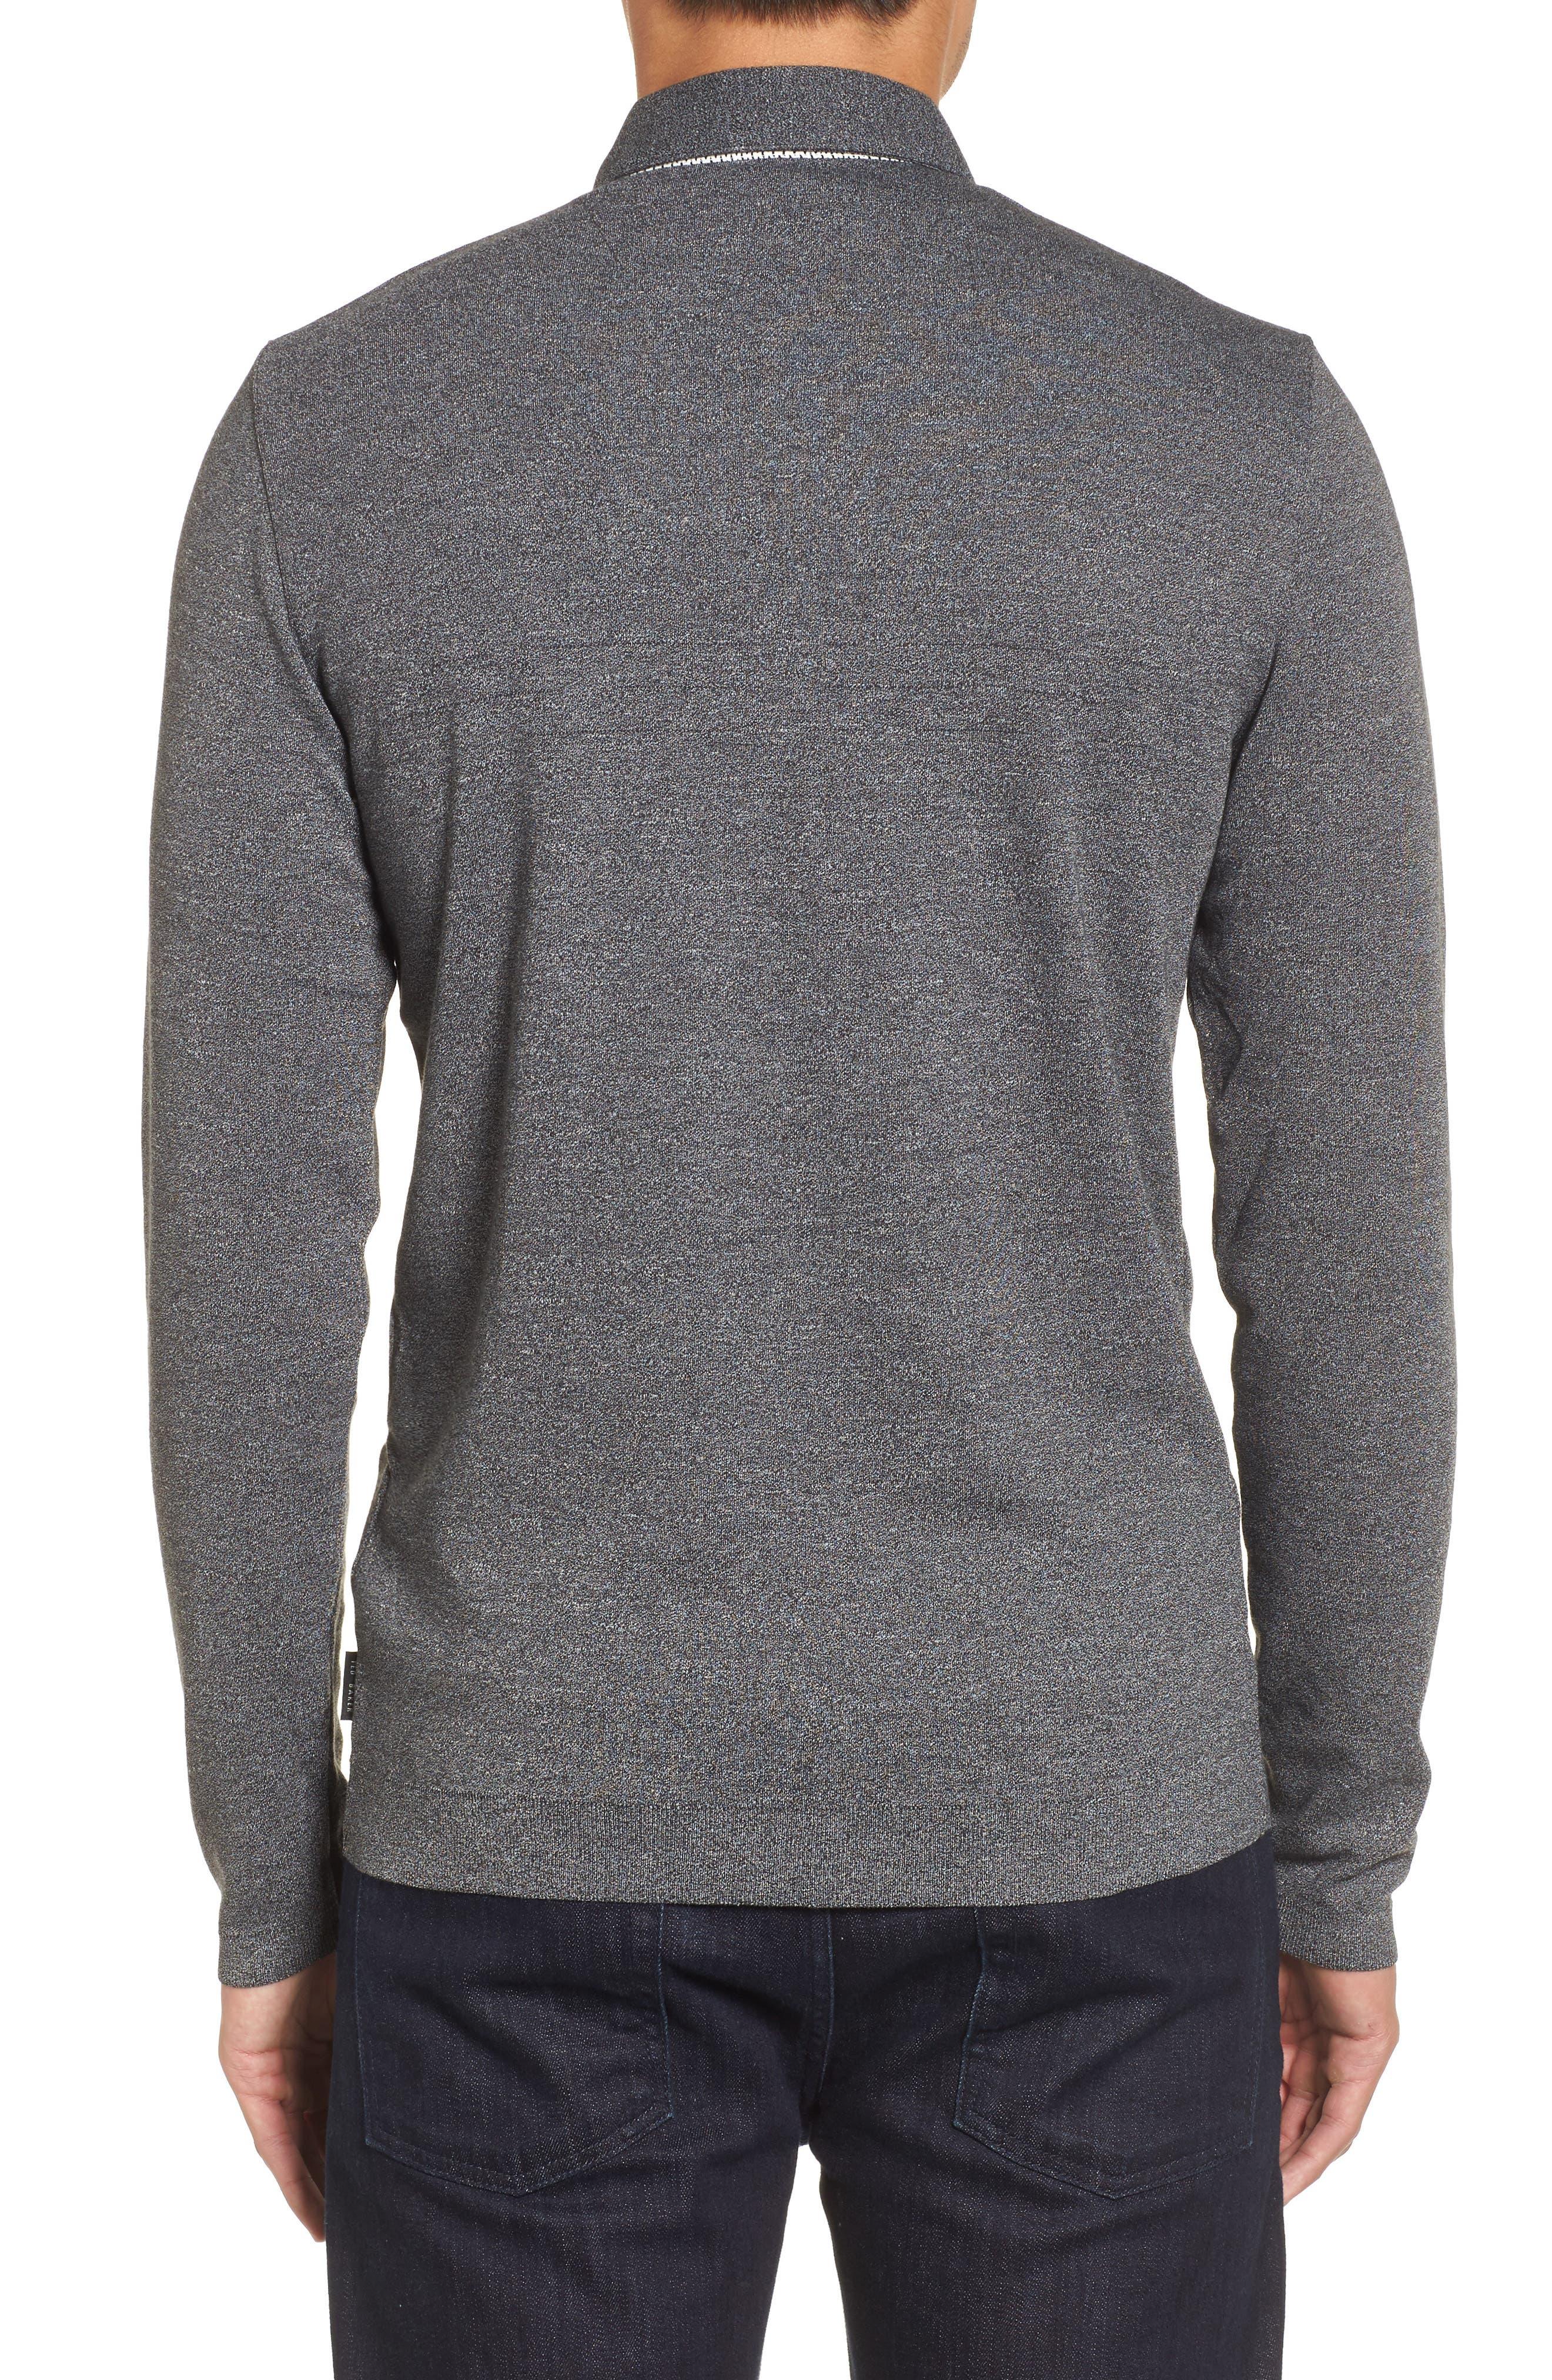 Yamway Modern Slim Fit Long Sleeve Polo,                             Alternate thumbnail 2, color,                             Black